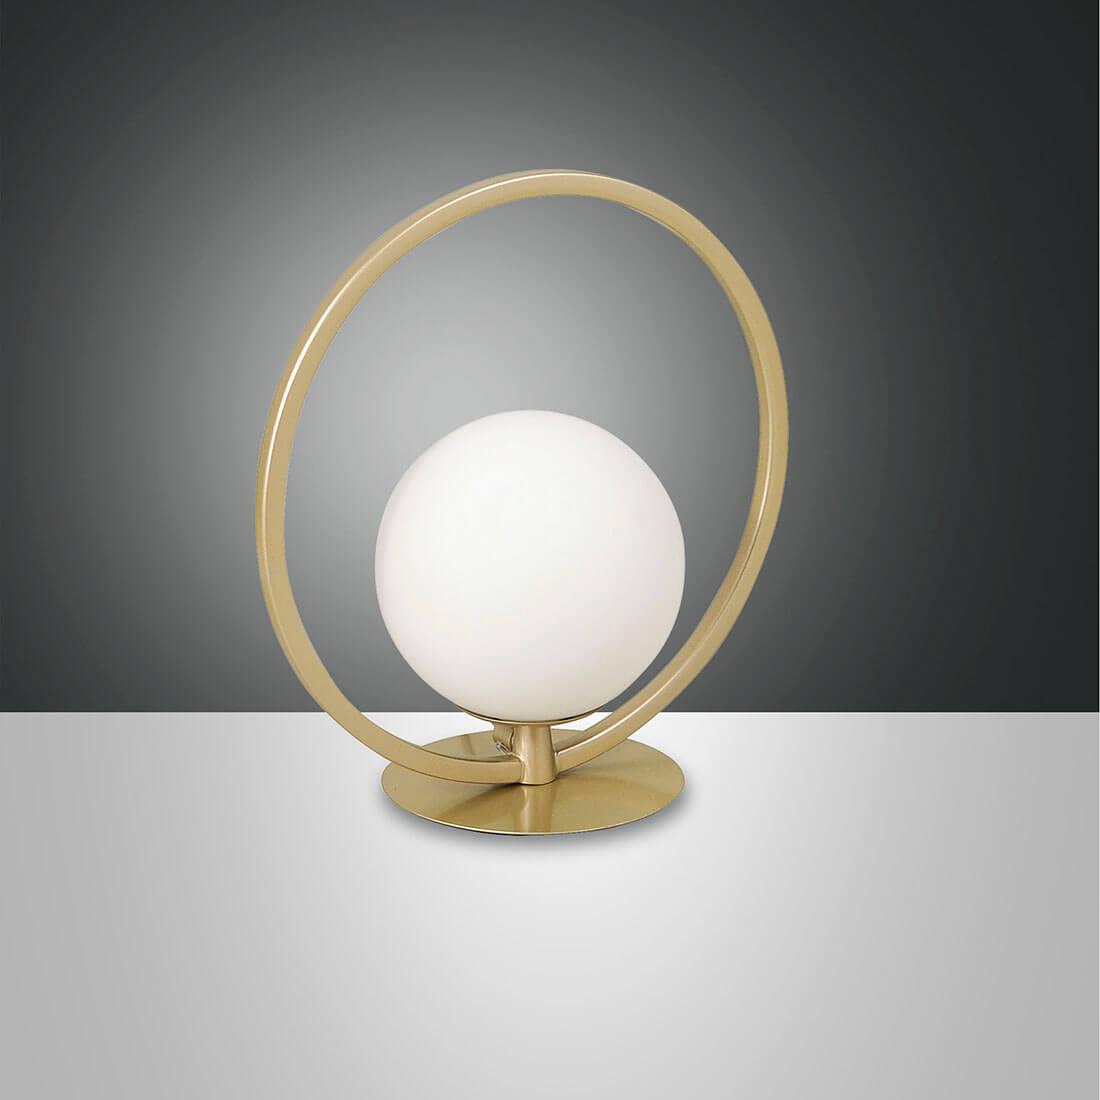 Настолна лампа Sirio I